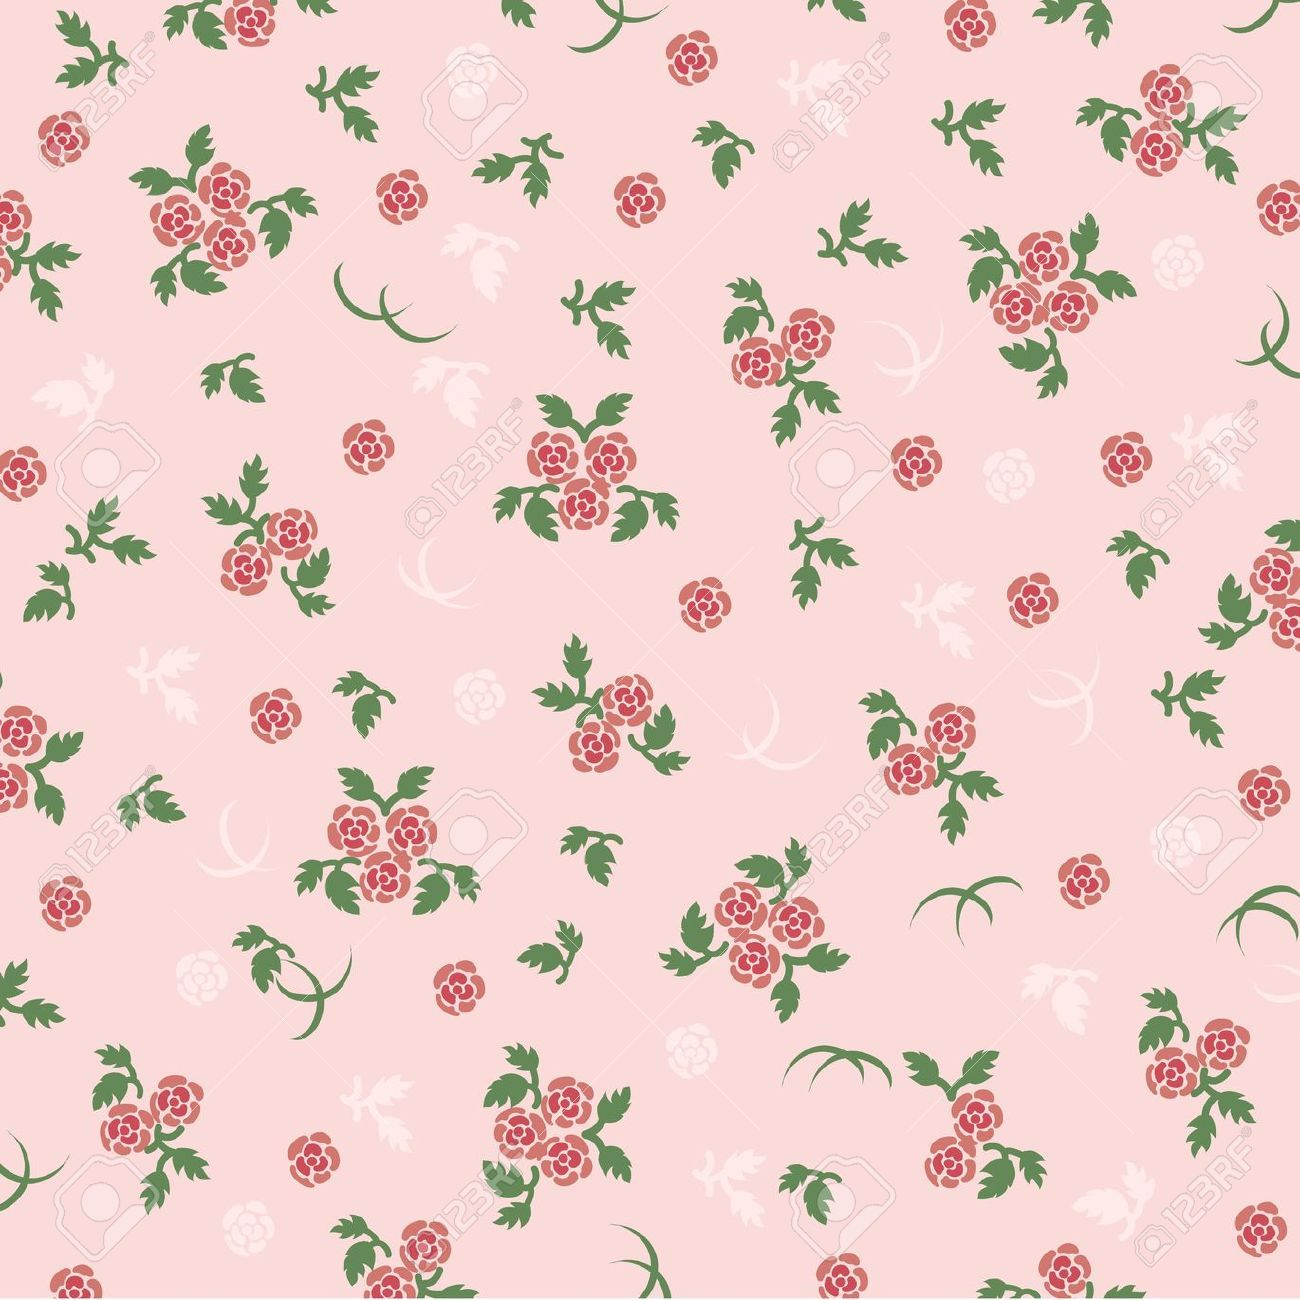 Pink roses vintage images hojas decoradas pinterest - Laminas decorativas para pared ...